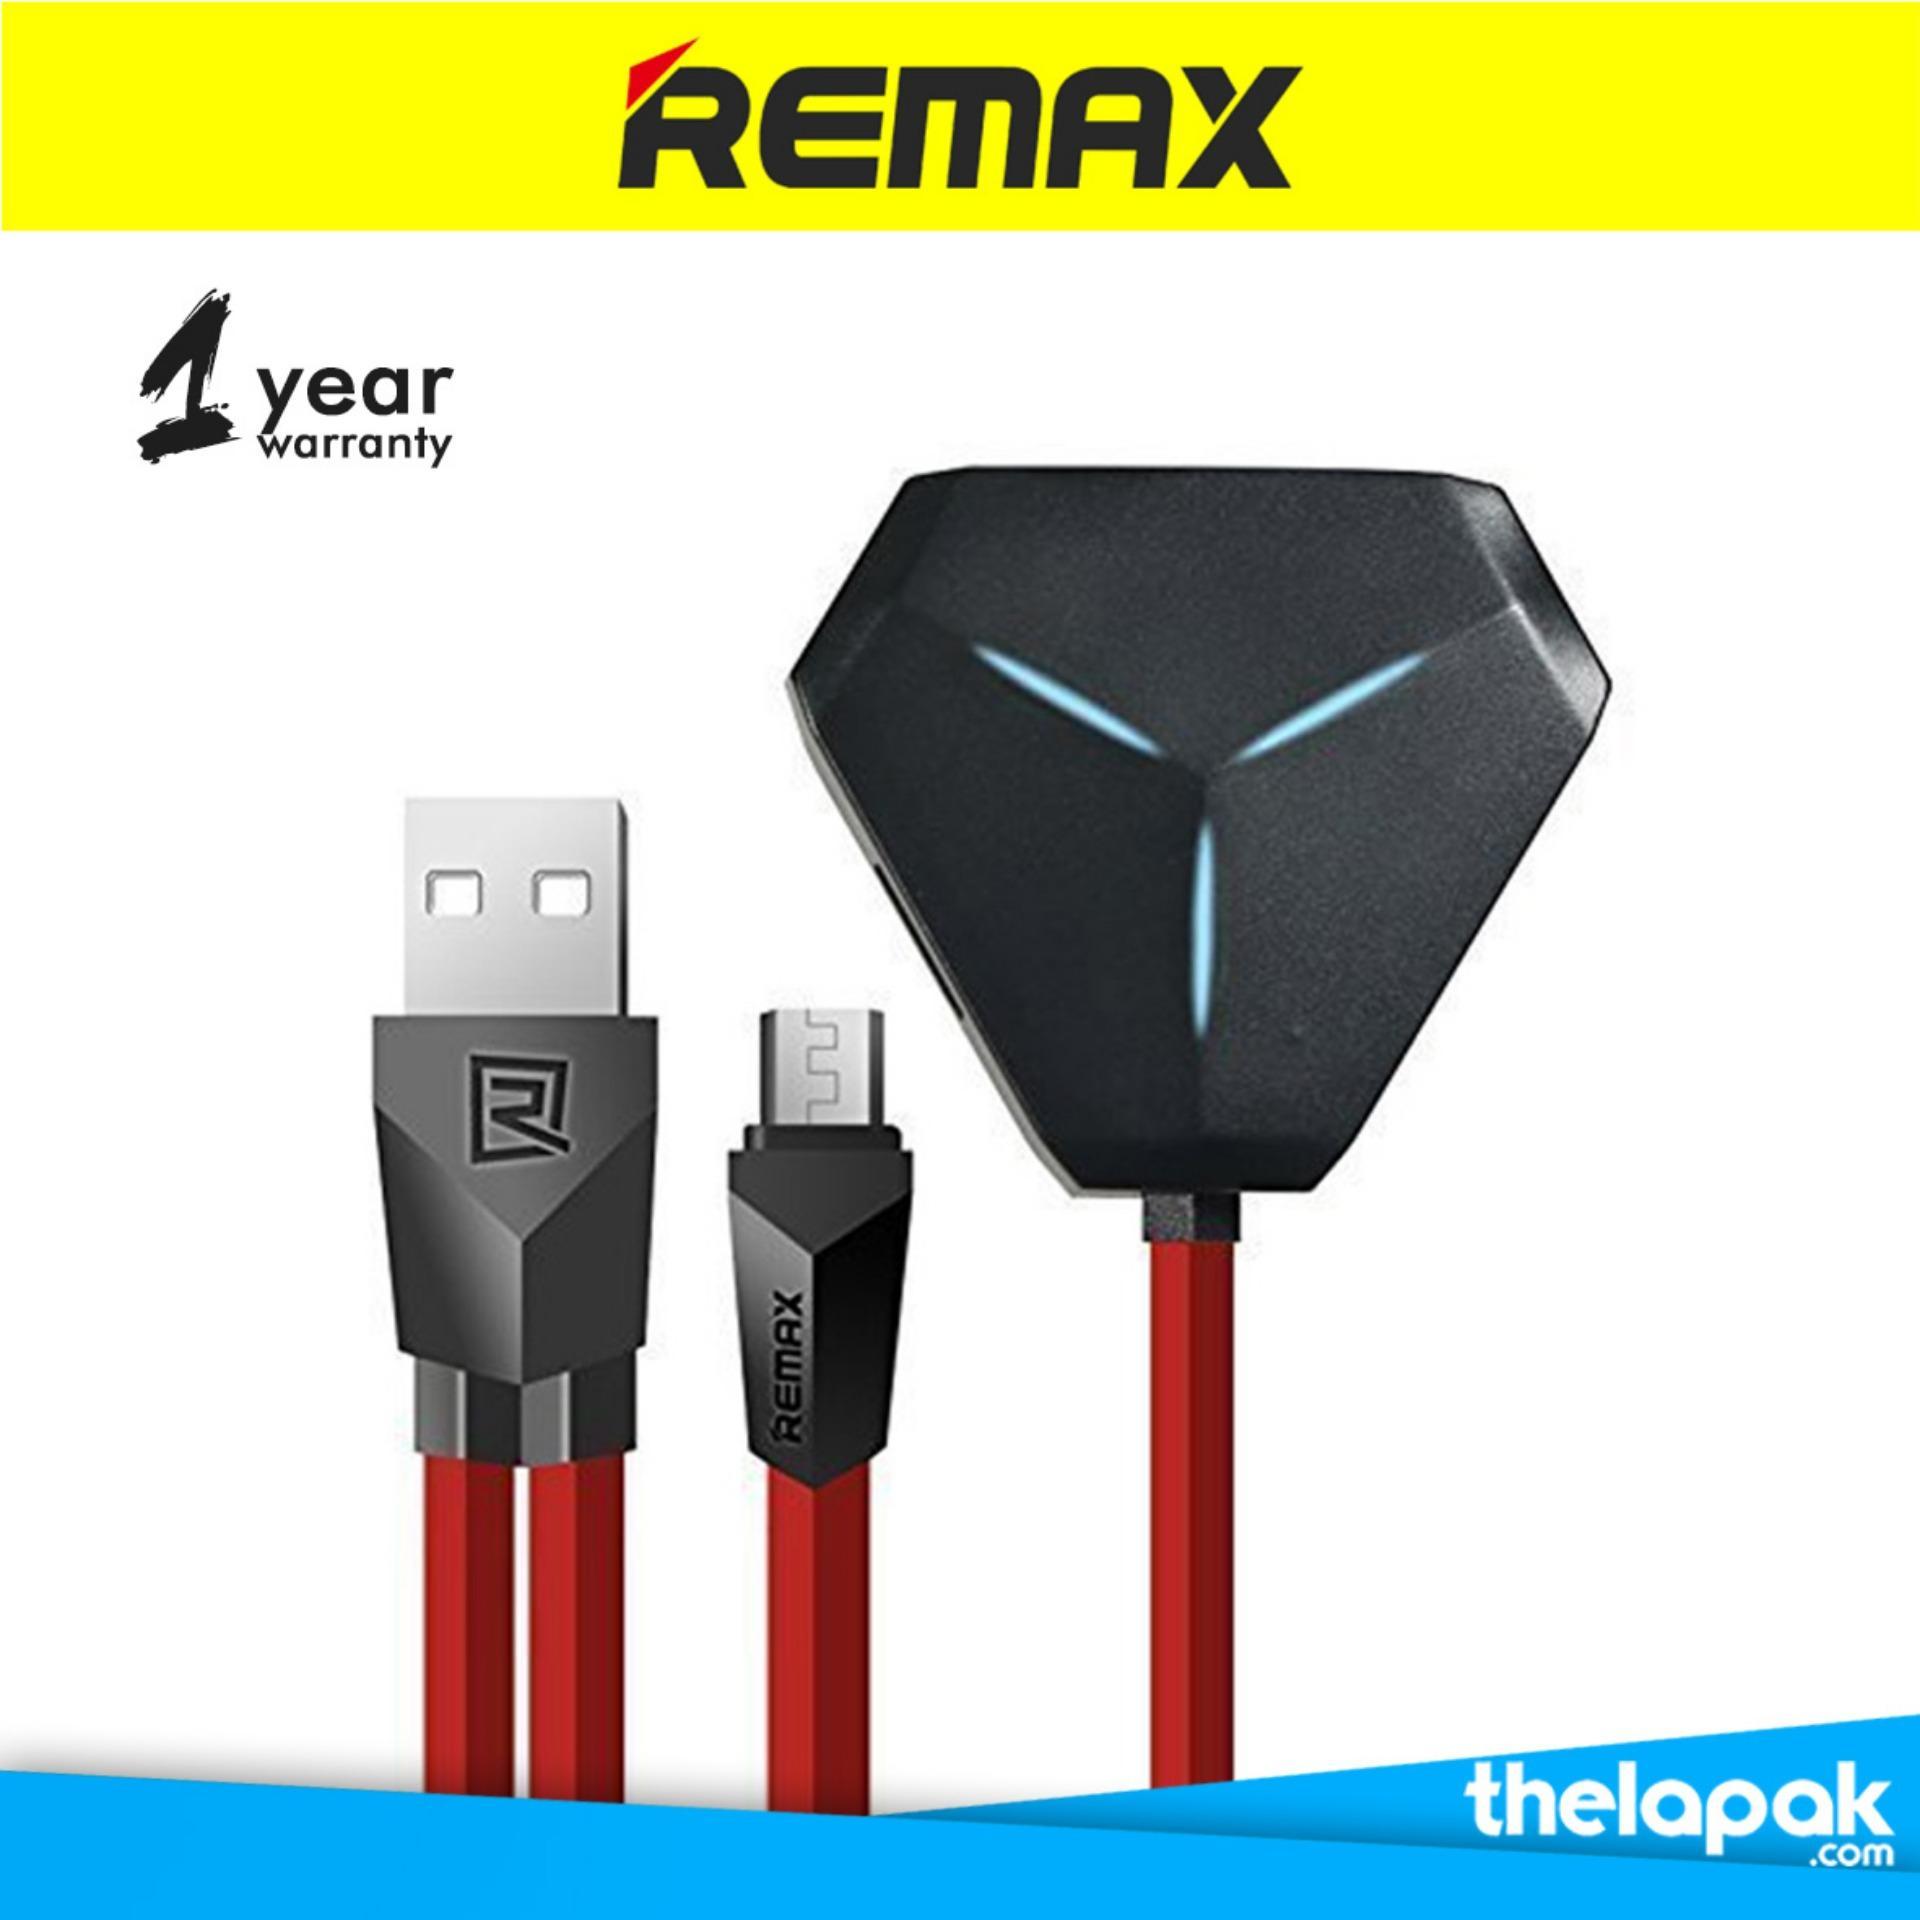 Promo Remax Alien 3 Ports Usb Hub Otg Red